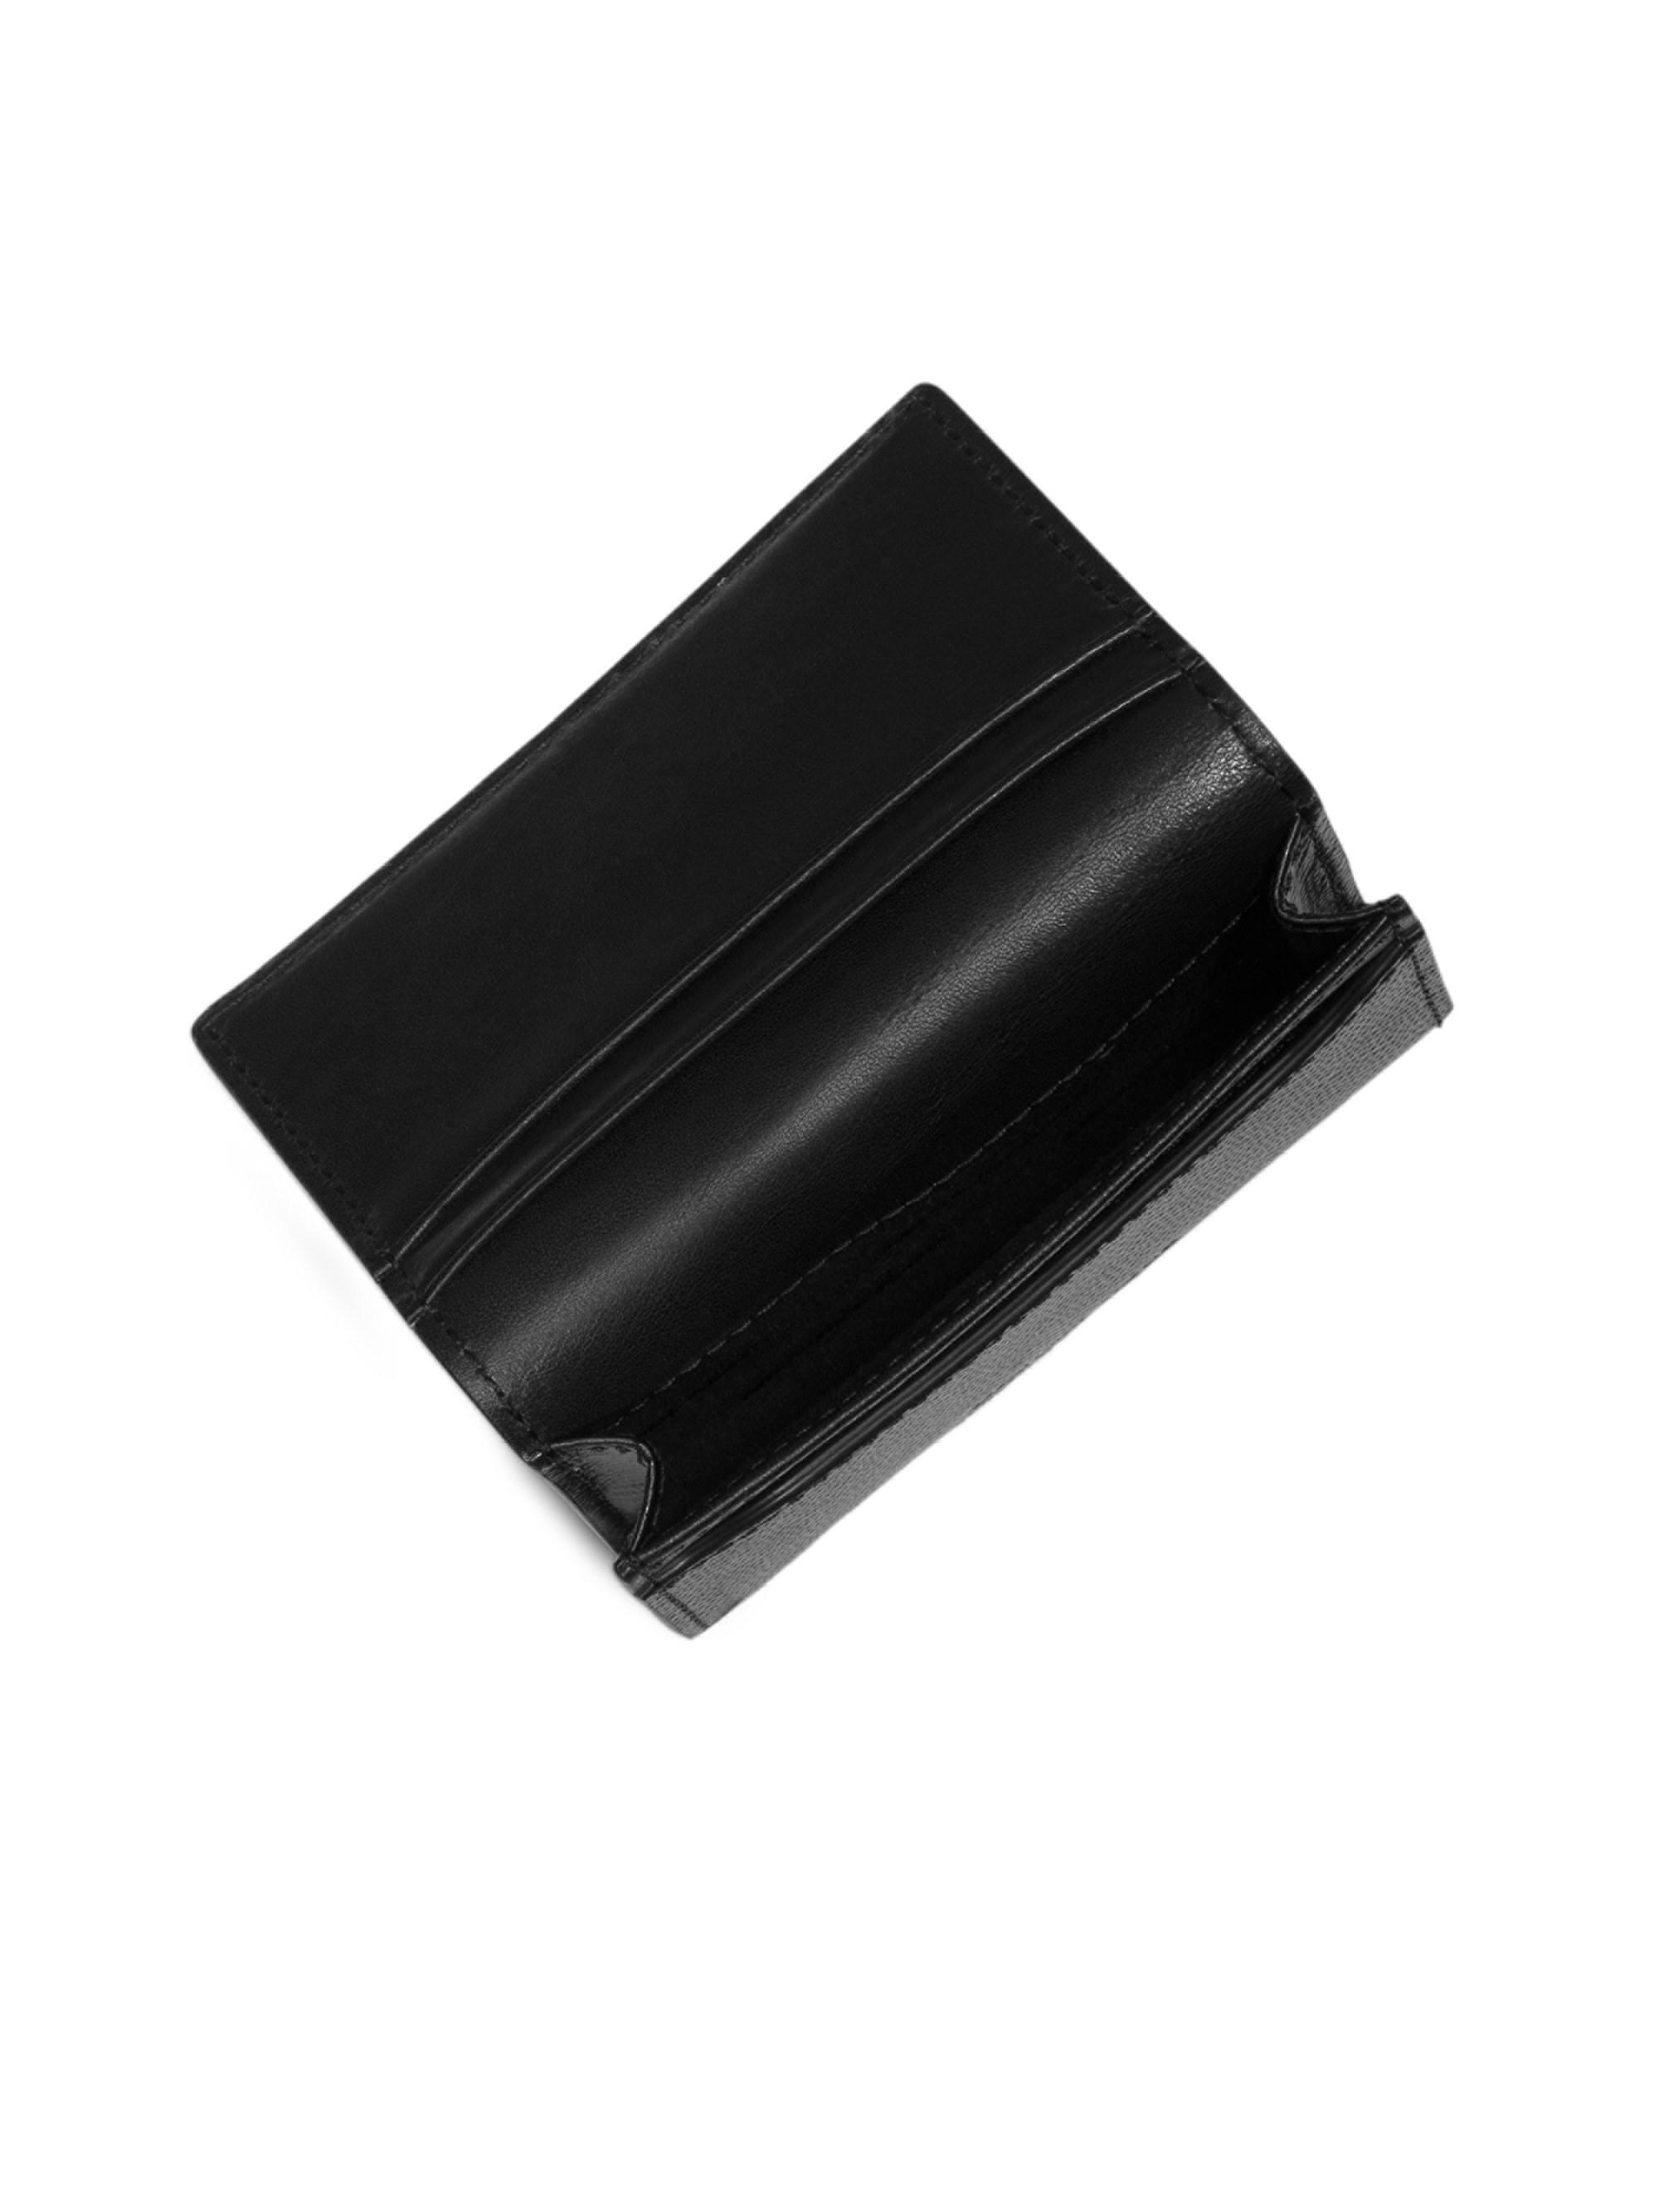 8a7b95c89bca Lyst - Michael Kors Harrison Business Card Holder in Black for Men